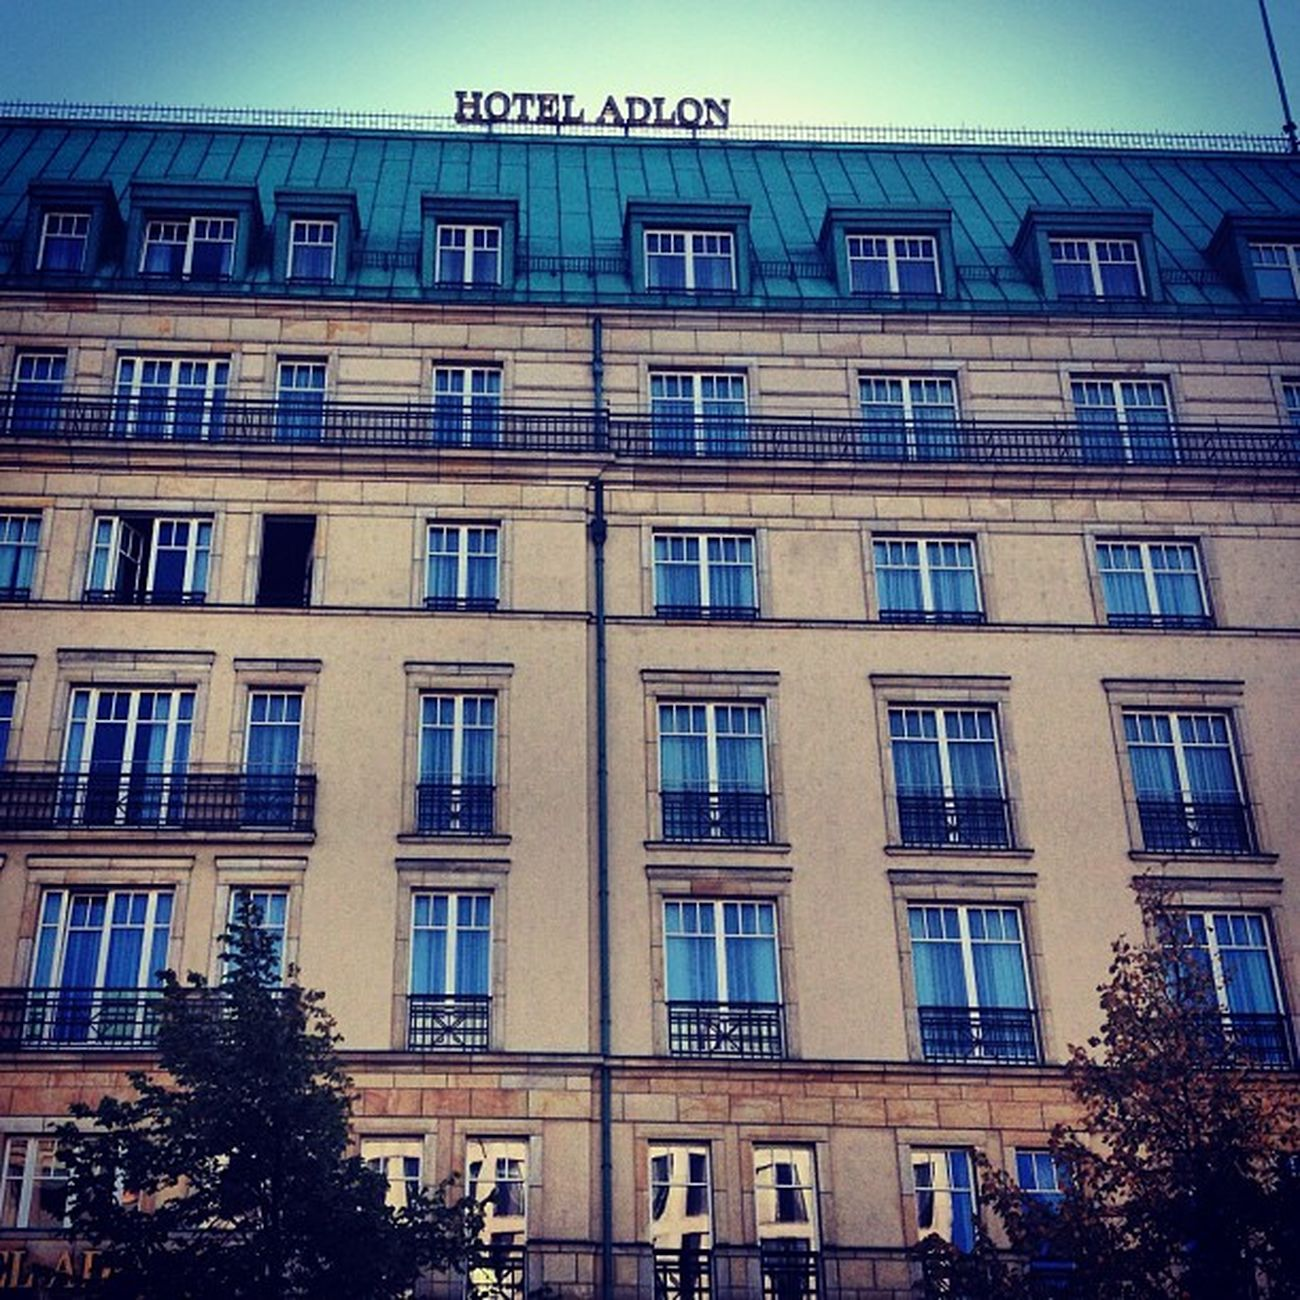 #architecture #Berlin #igersberlin #instagood #tweegram #photooftheday #follow #instamod #igers #picoftheday #instragamhub #instadaily #insta_germany #bestoftheday #igdaily #webstagram #instragramers #ig_special #igersberlin #gf_germany #all_shots #hotela Follow Instamod All_shots Bestoftheday Adlon Igers IGDaily Tweegram Instagood Webstagram Instadaily Igersberlin Architecture Insta_germany Berlin Hoteladlon Gf_germany Hotel Instragramers Photooftheday Ig_special Picoftheday Instragamhub